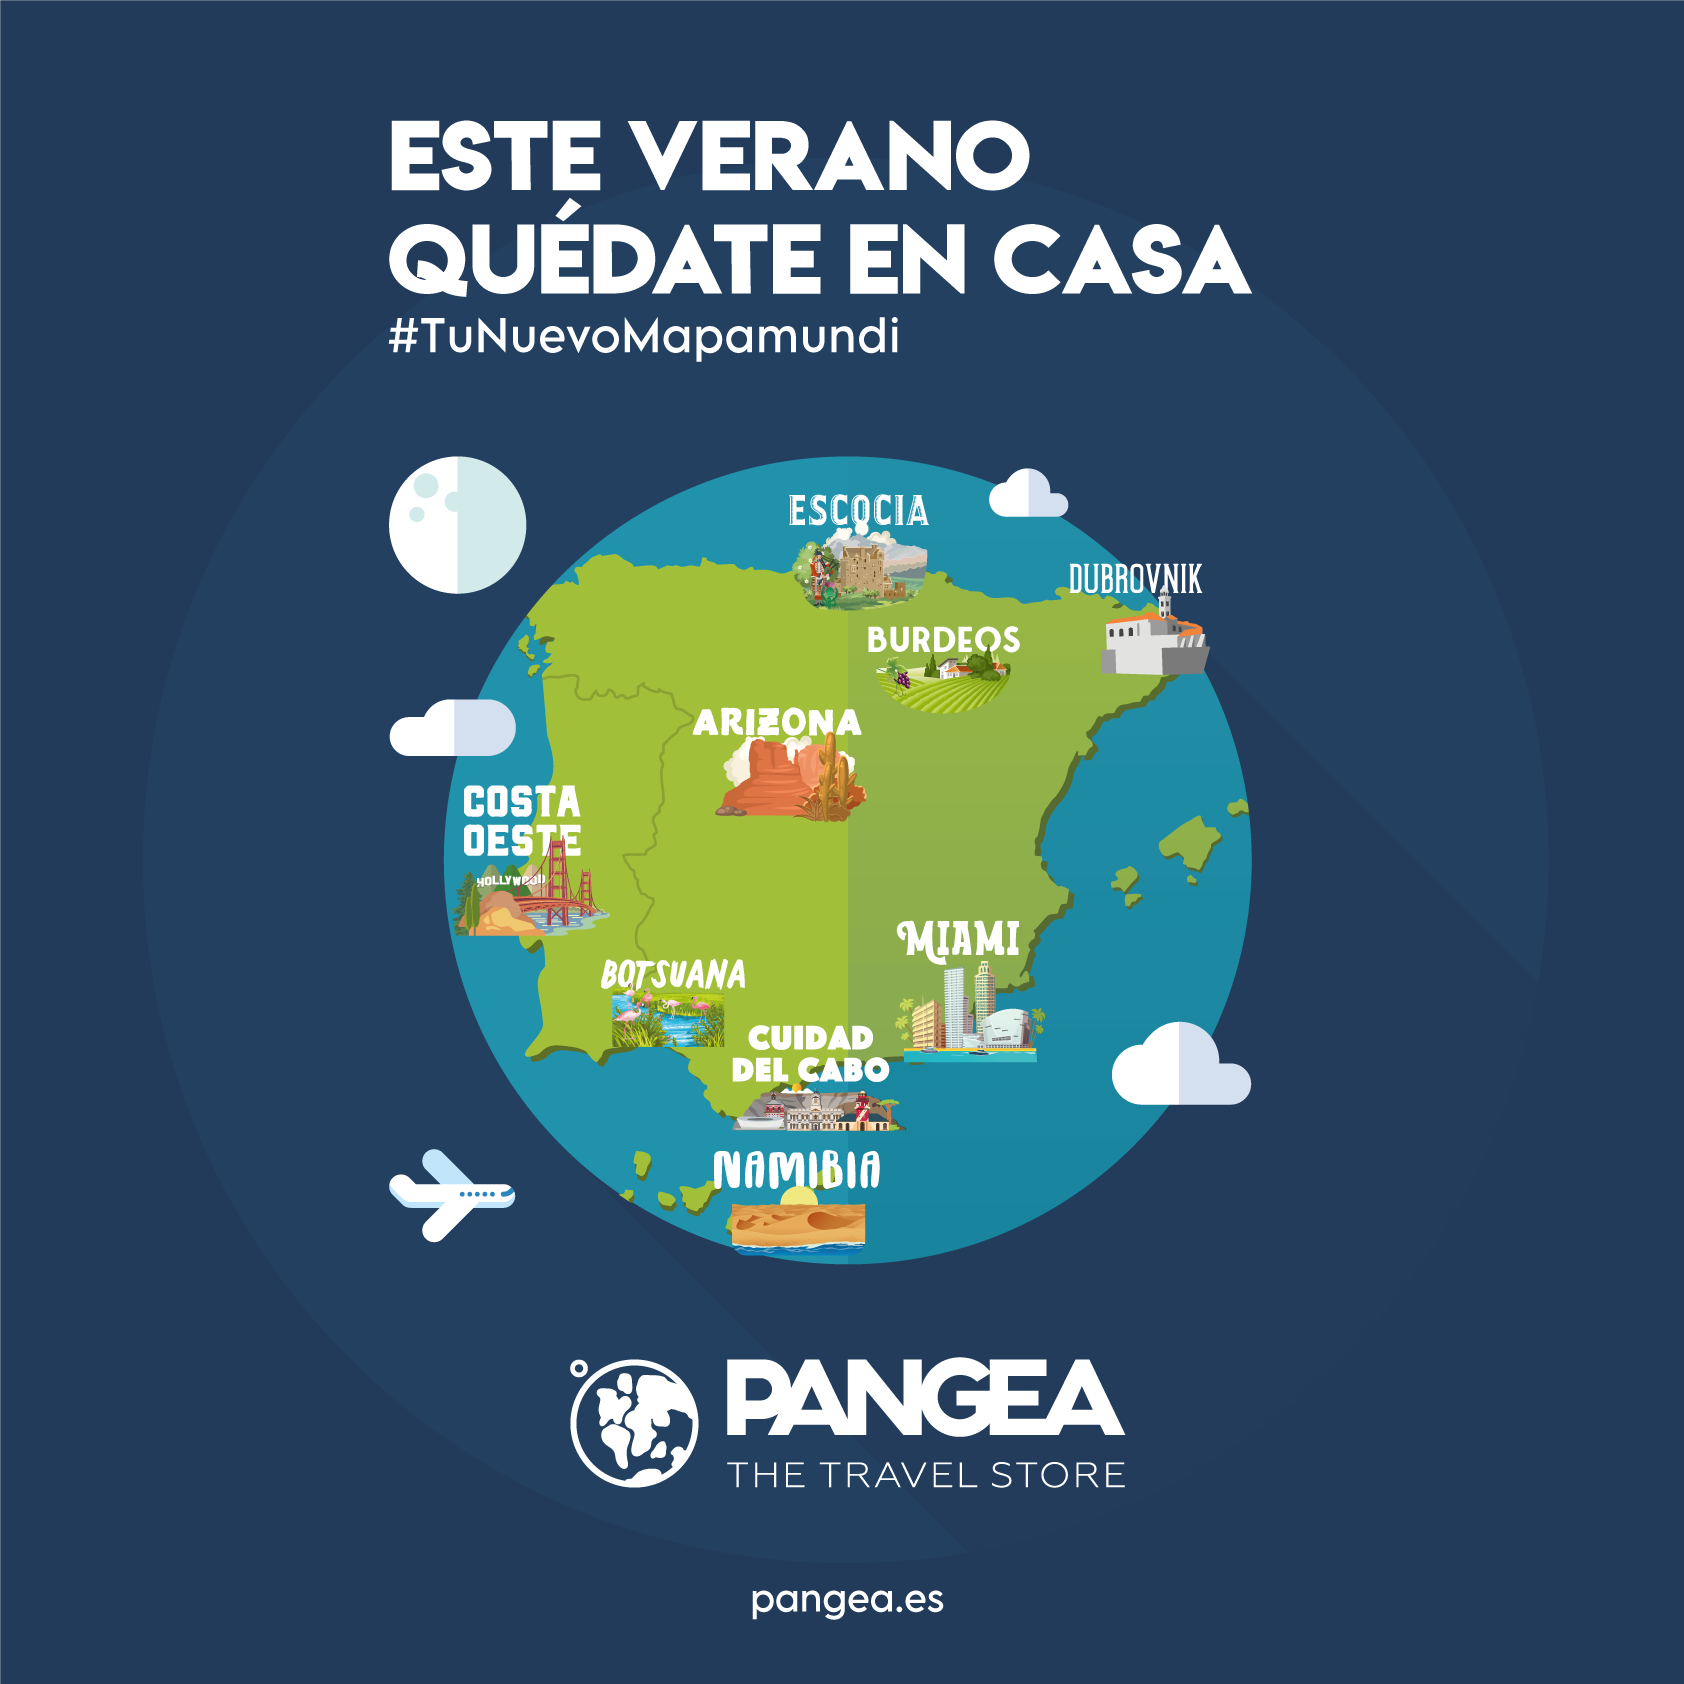 PANGEA The Travel Store presenta #TuNuevoMapamundi, grandes destinos sin salir de casa para este verano